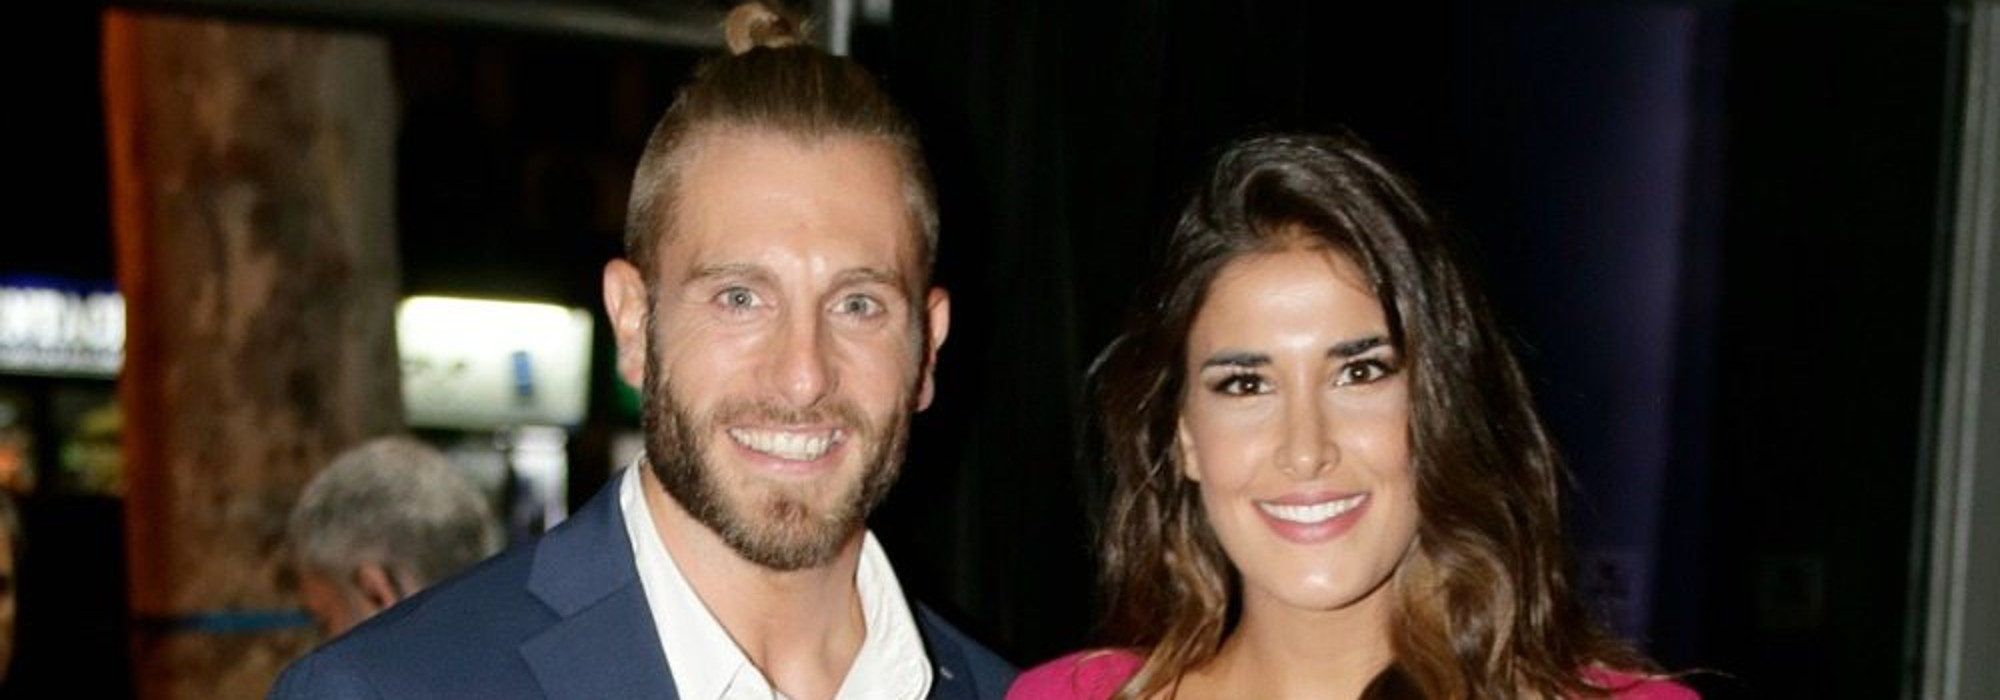 Lidia Torrent y Matías Roure ('First dates') responden al test del amor en el programa de radio de Dani Mateo